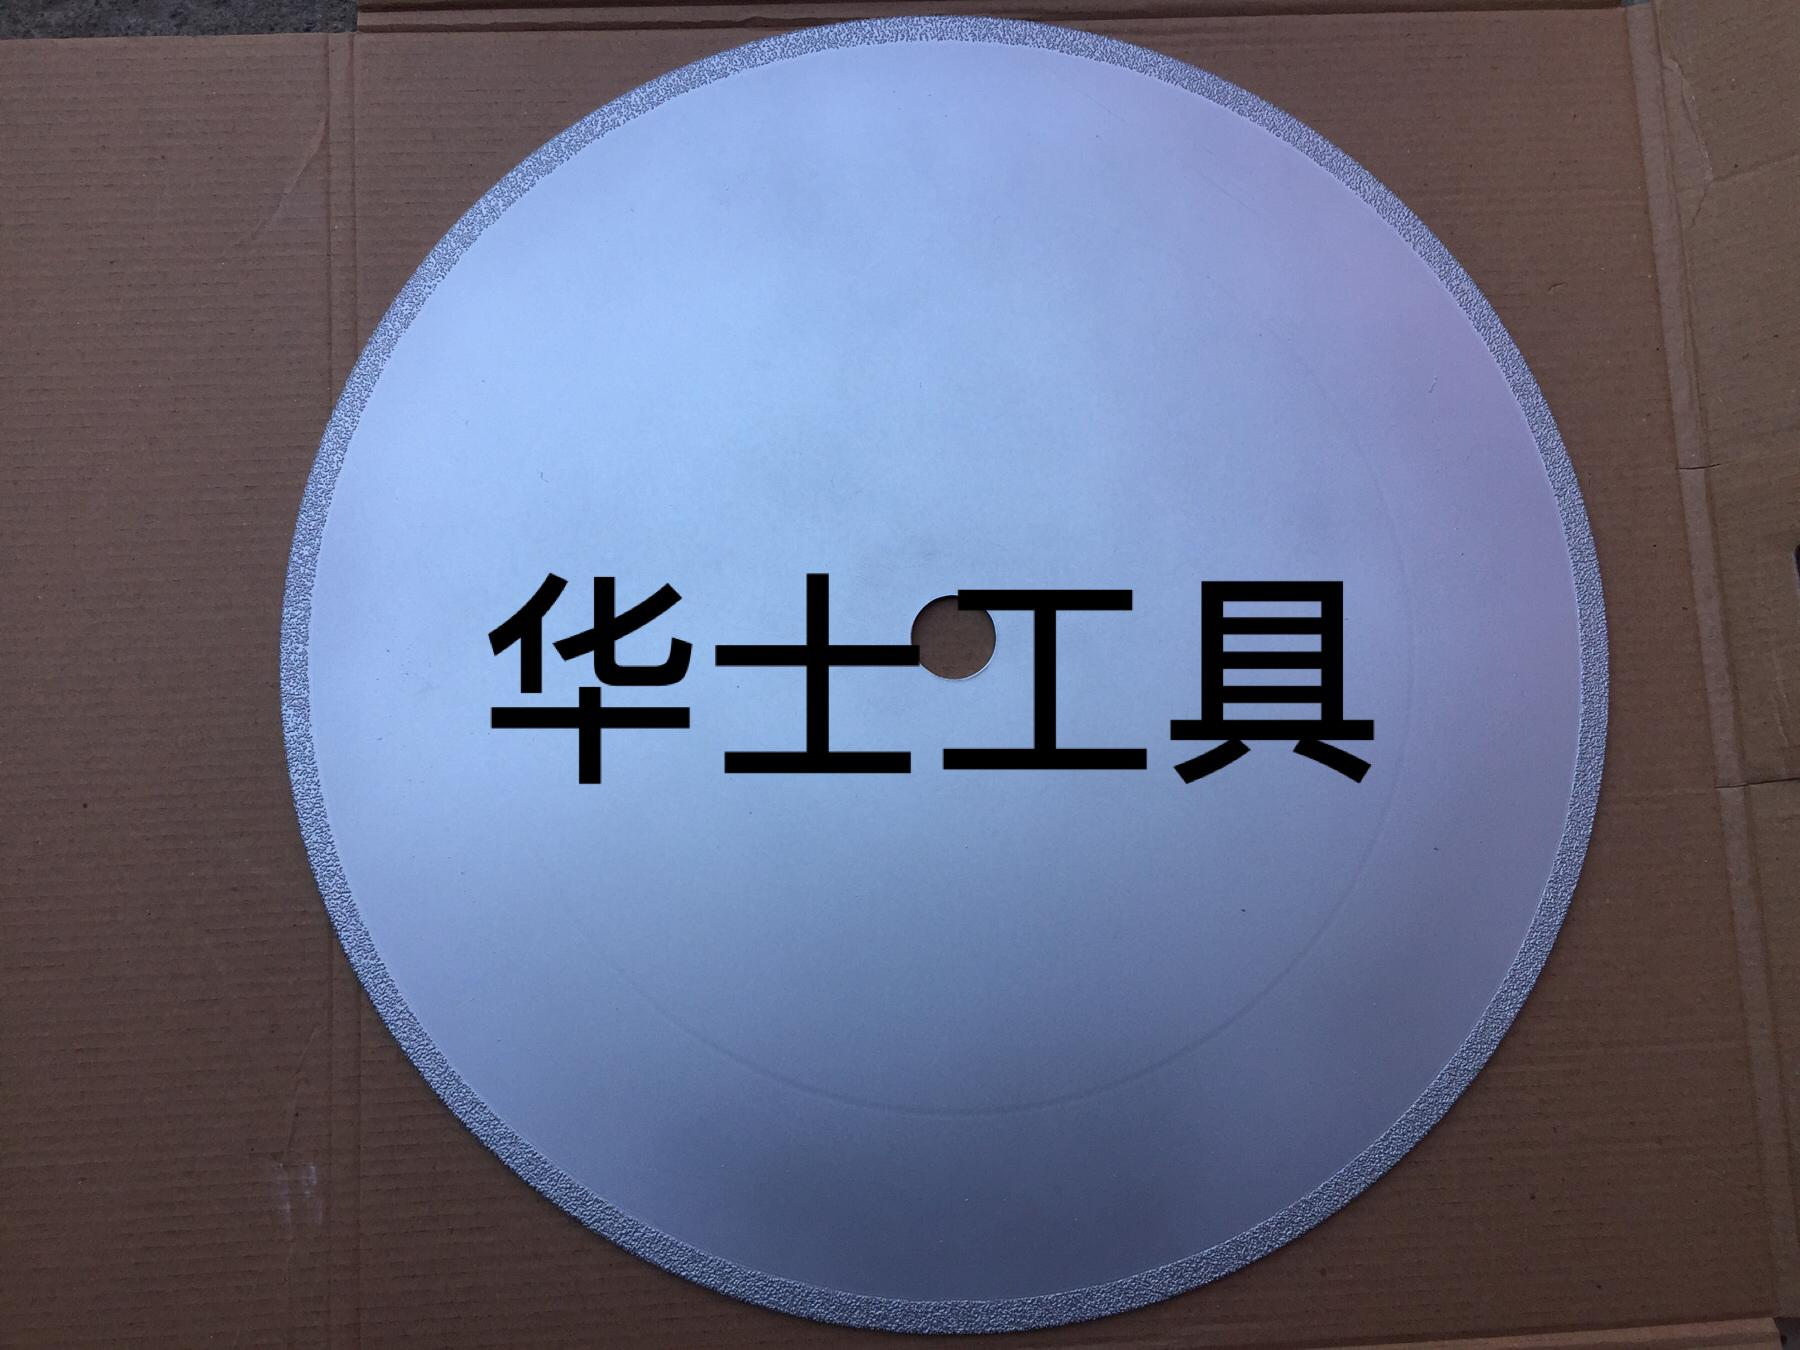 Acrylic-Diamond saw blade   Sanitary appliance -Diamond saw blade  1